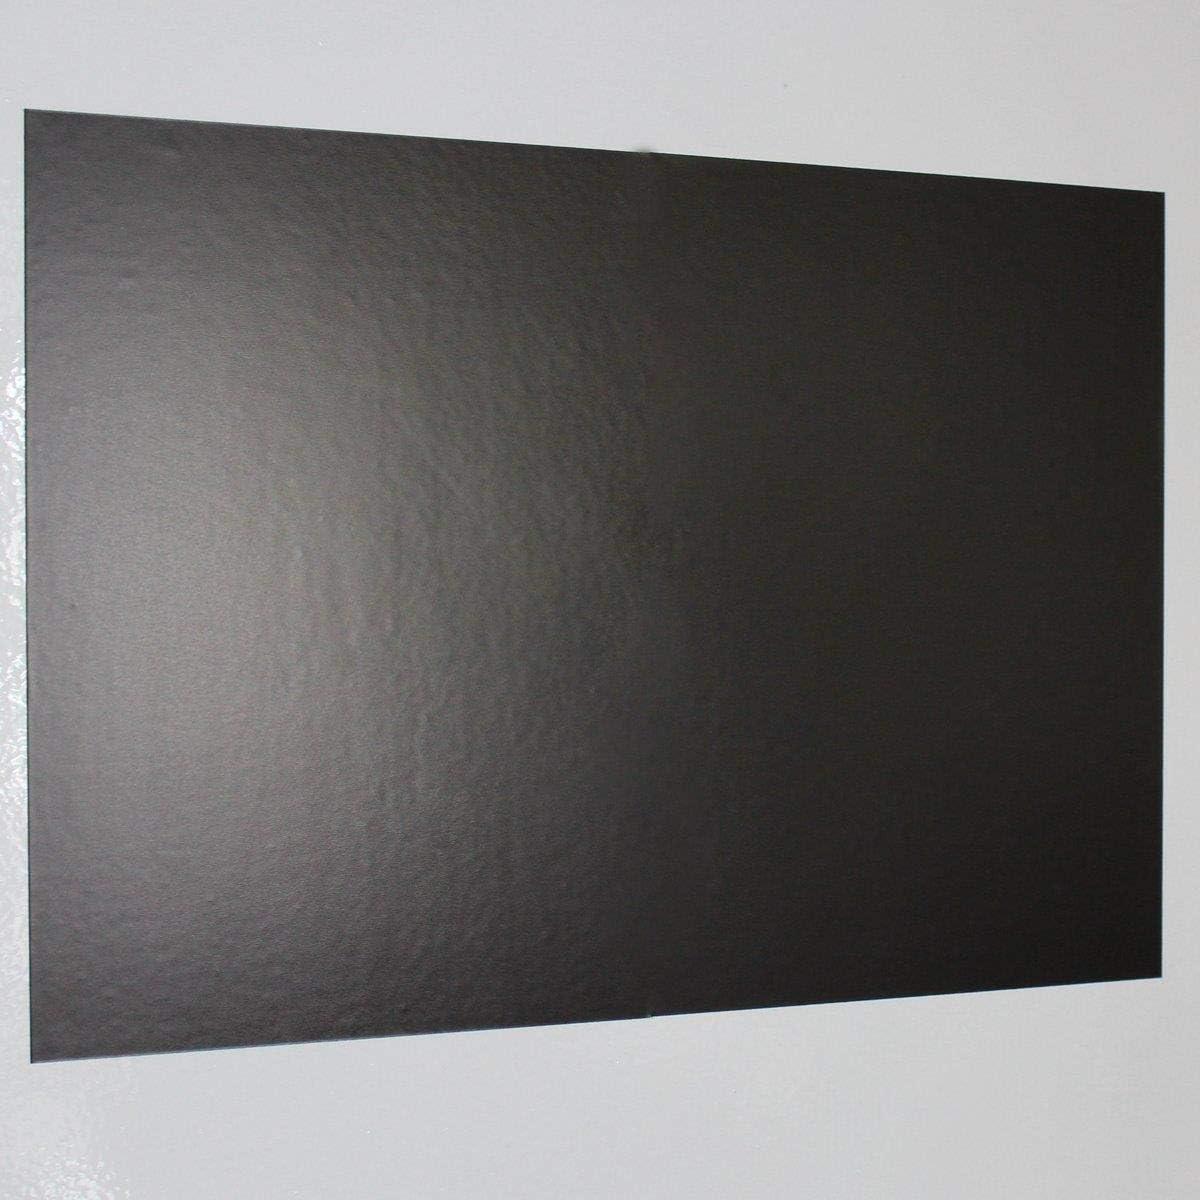 Pantalla magnética autoadhesiva de Magstick®, 1unidadTamaño DIN A3, lado adherente sin revestimiento, superficie adherente flexible para imanes potentes, pantalla ferrosa